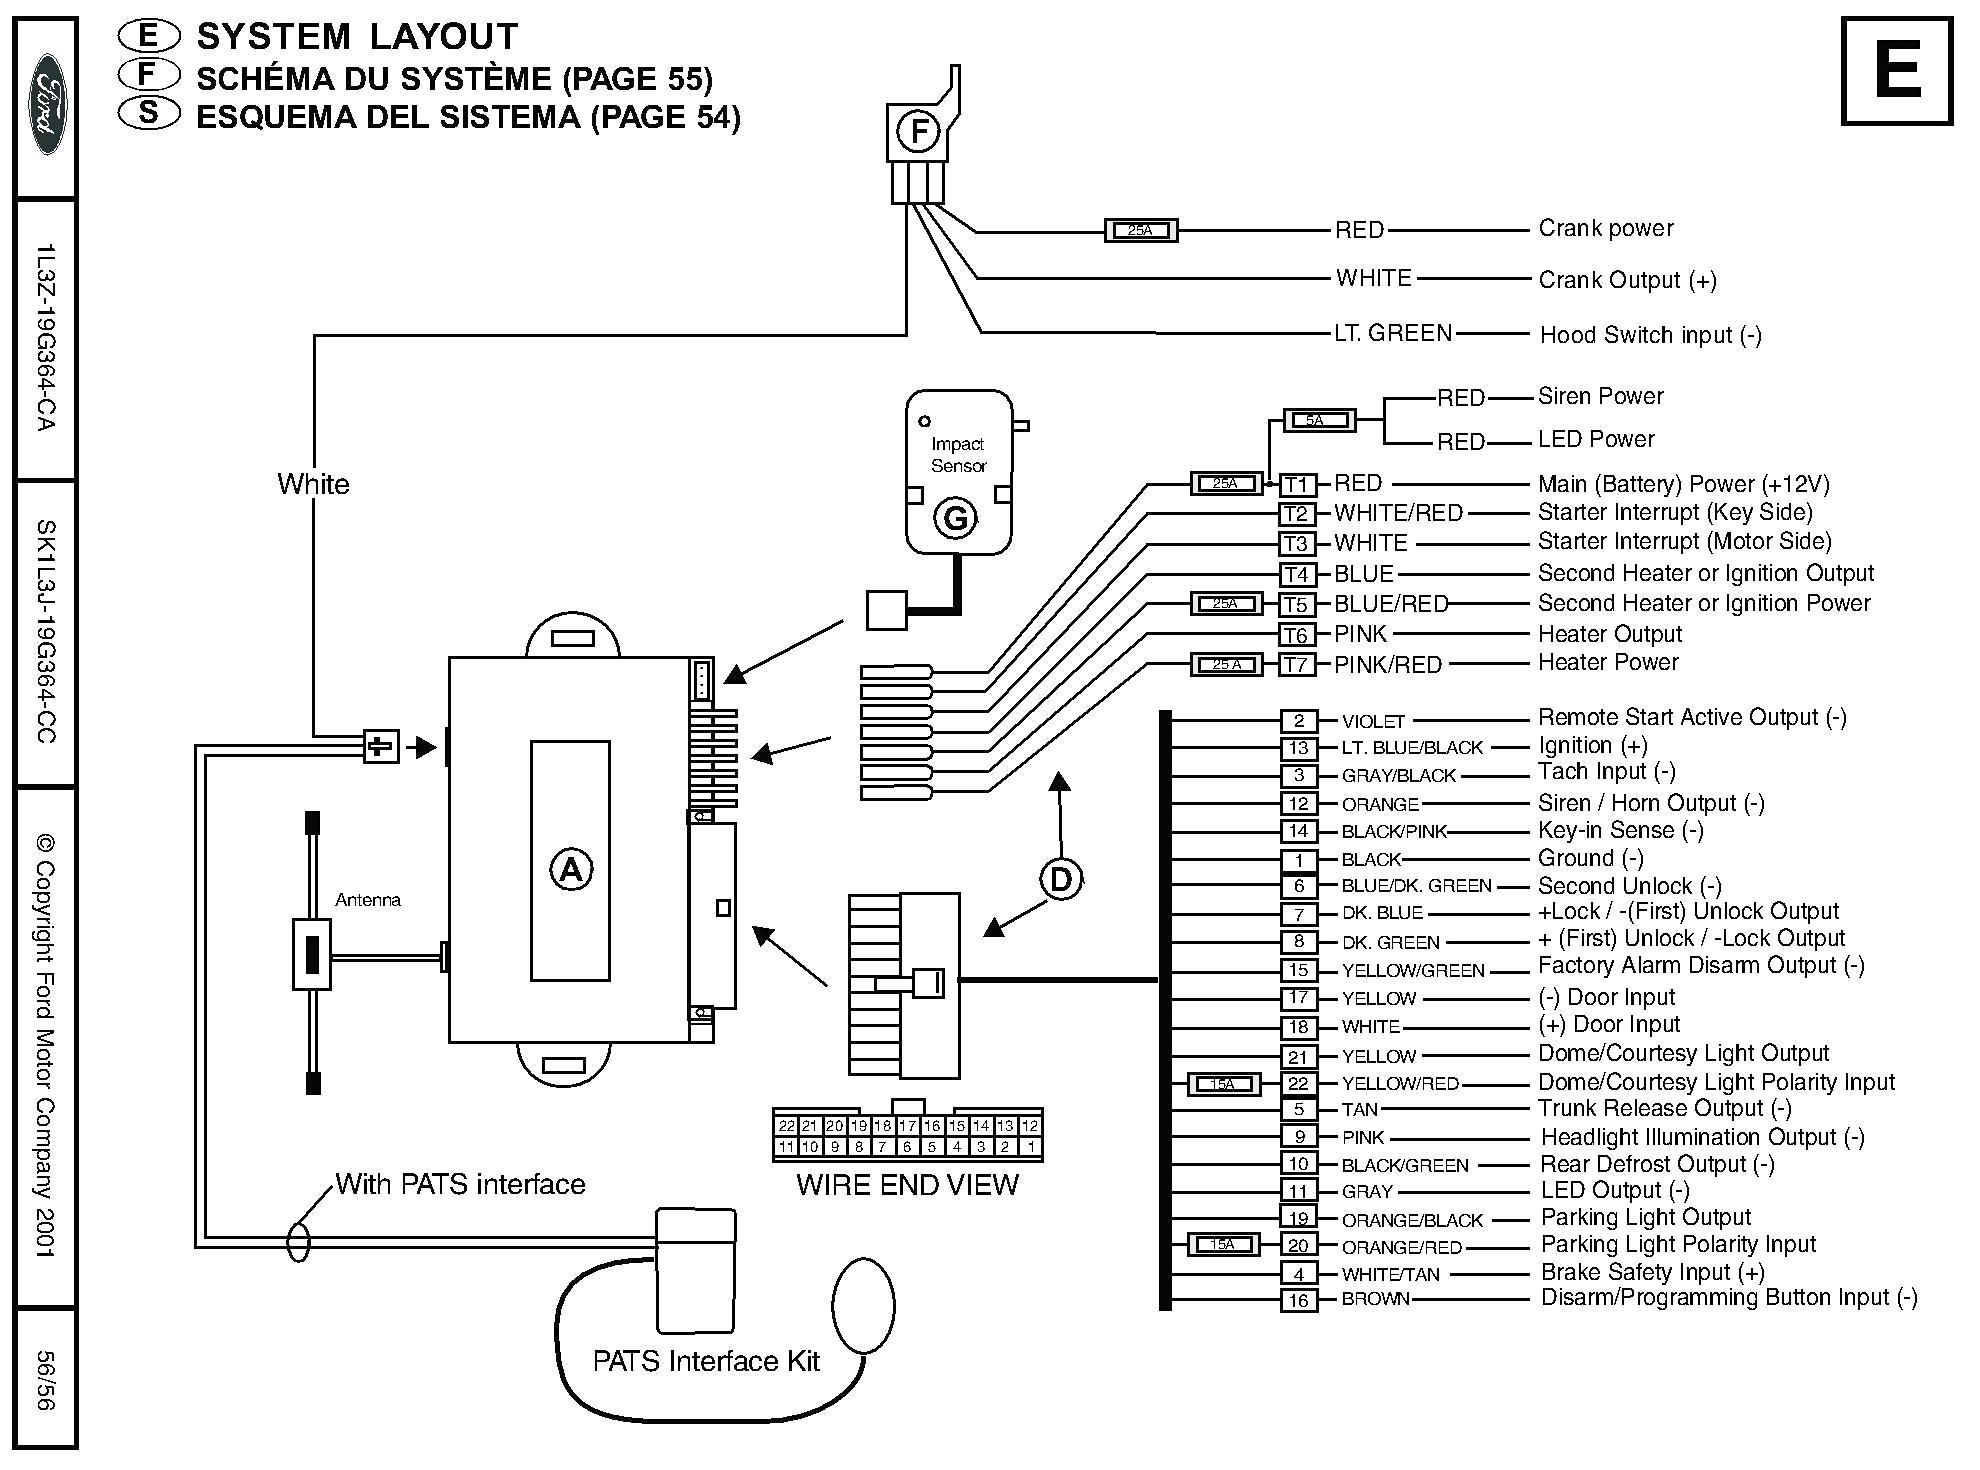 Bulldog Car Wiring Diagrams Wiring Diagram Alarm Motor Valid Vehicle Wiring Diagrams for Alarms